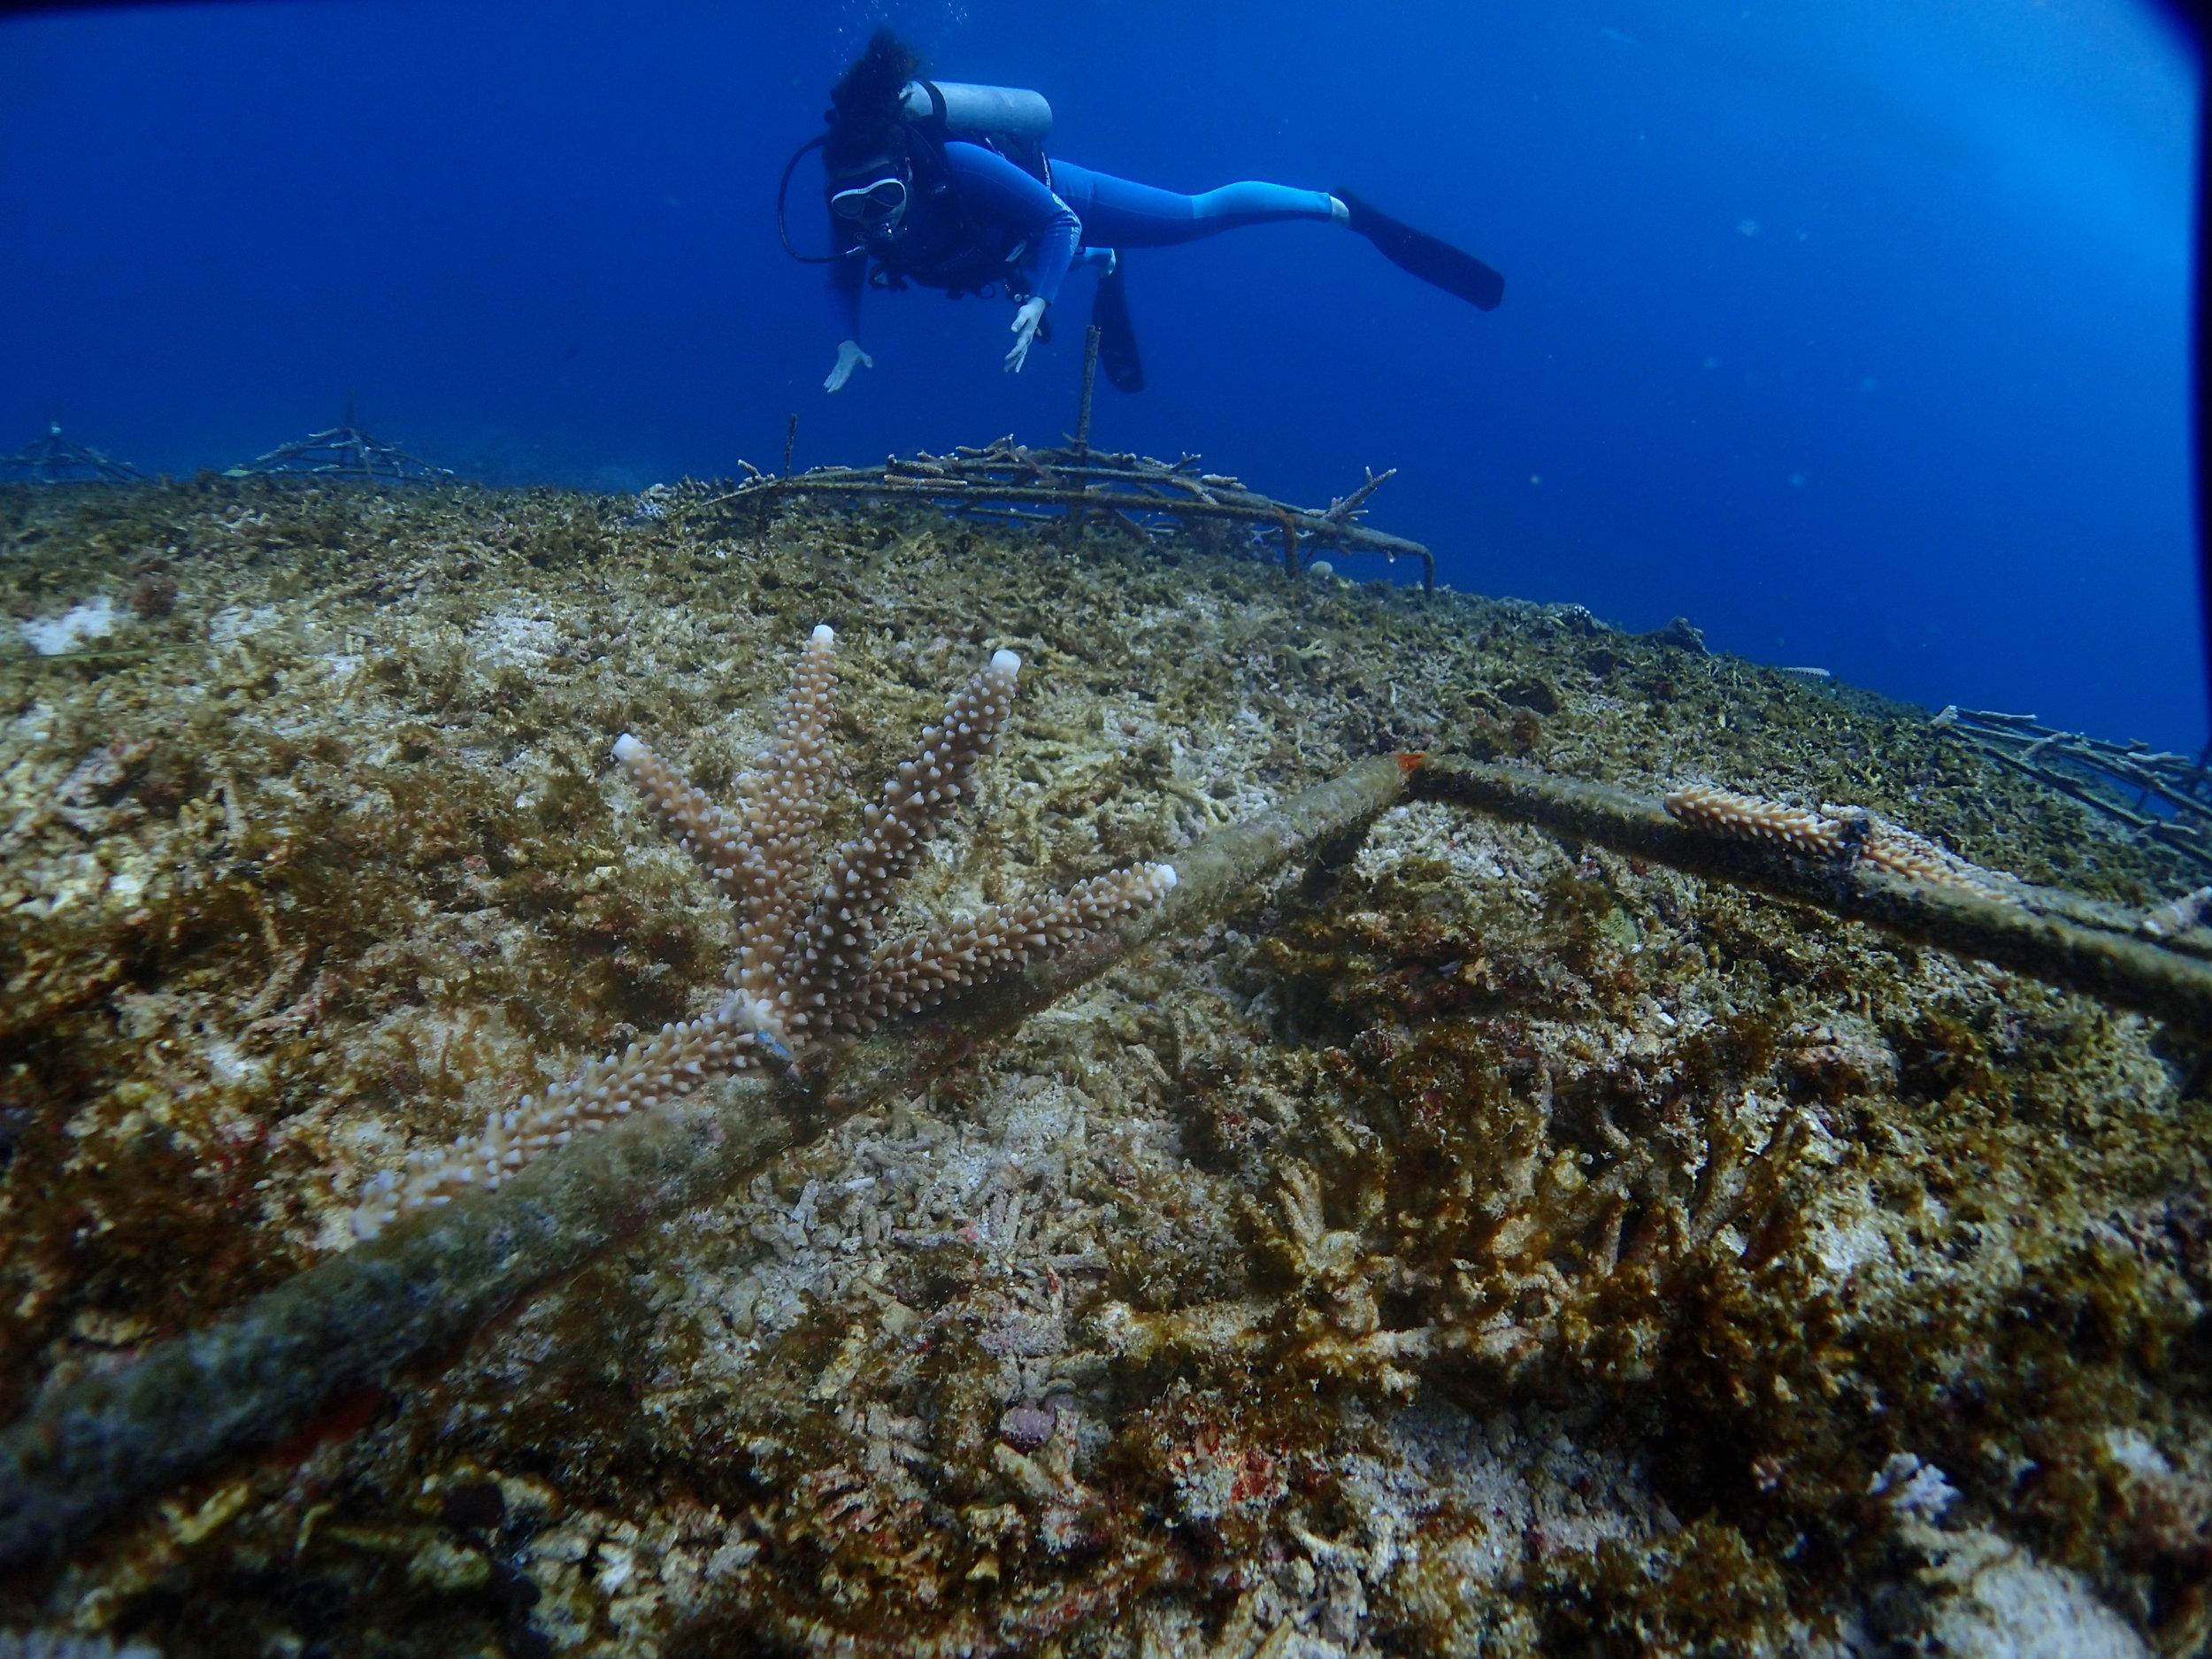 Coral Restoration artificial reefs